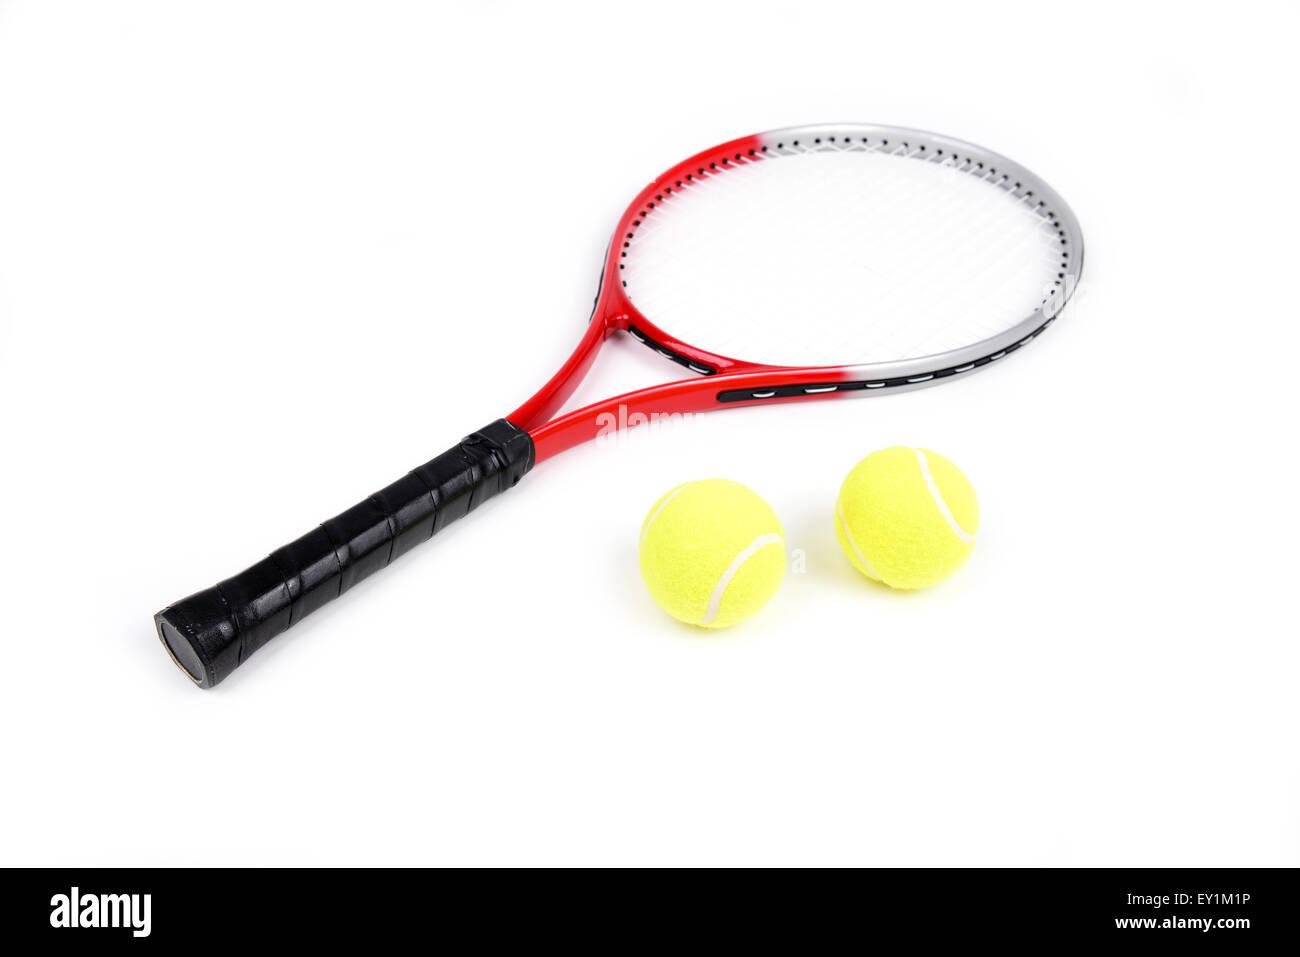 Raqueta de tenis aislado sobre fondo blanco. Imagen De Stock